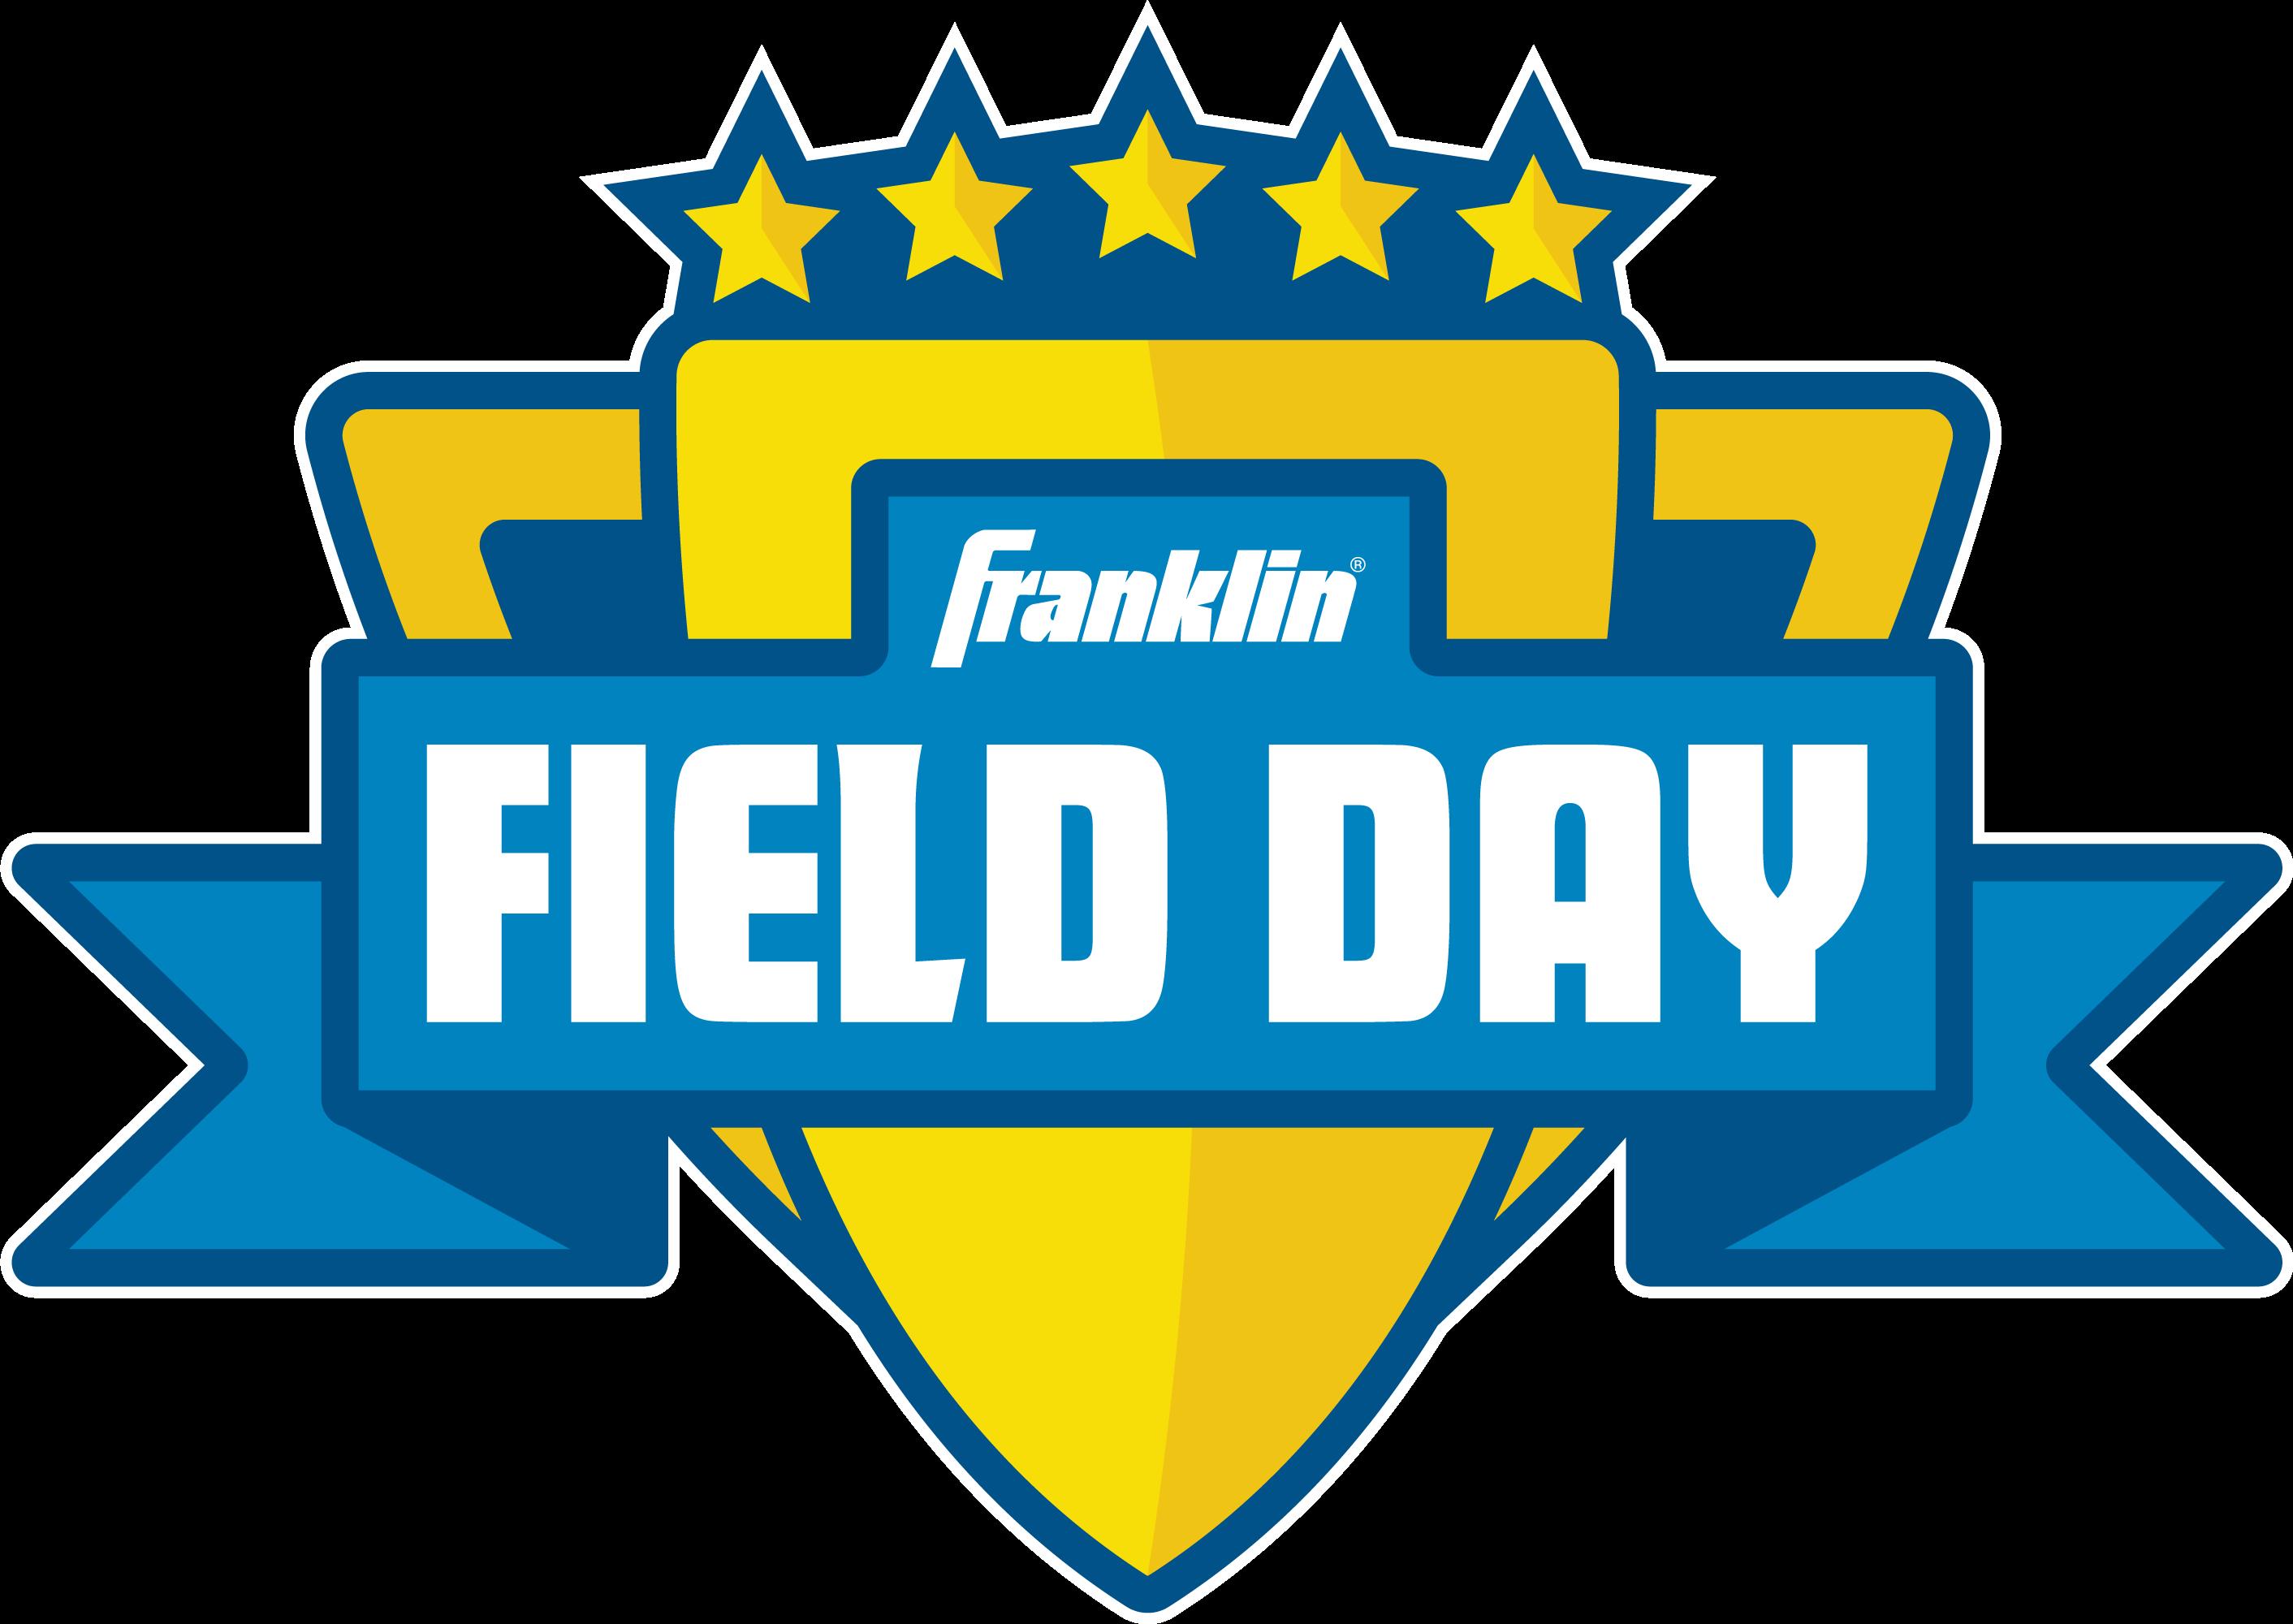 Franklin Field Day Preliminary First Logo